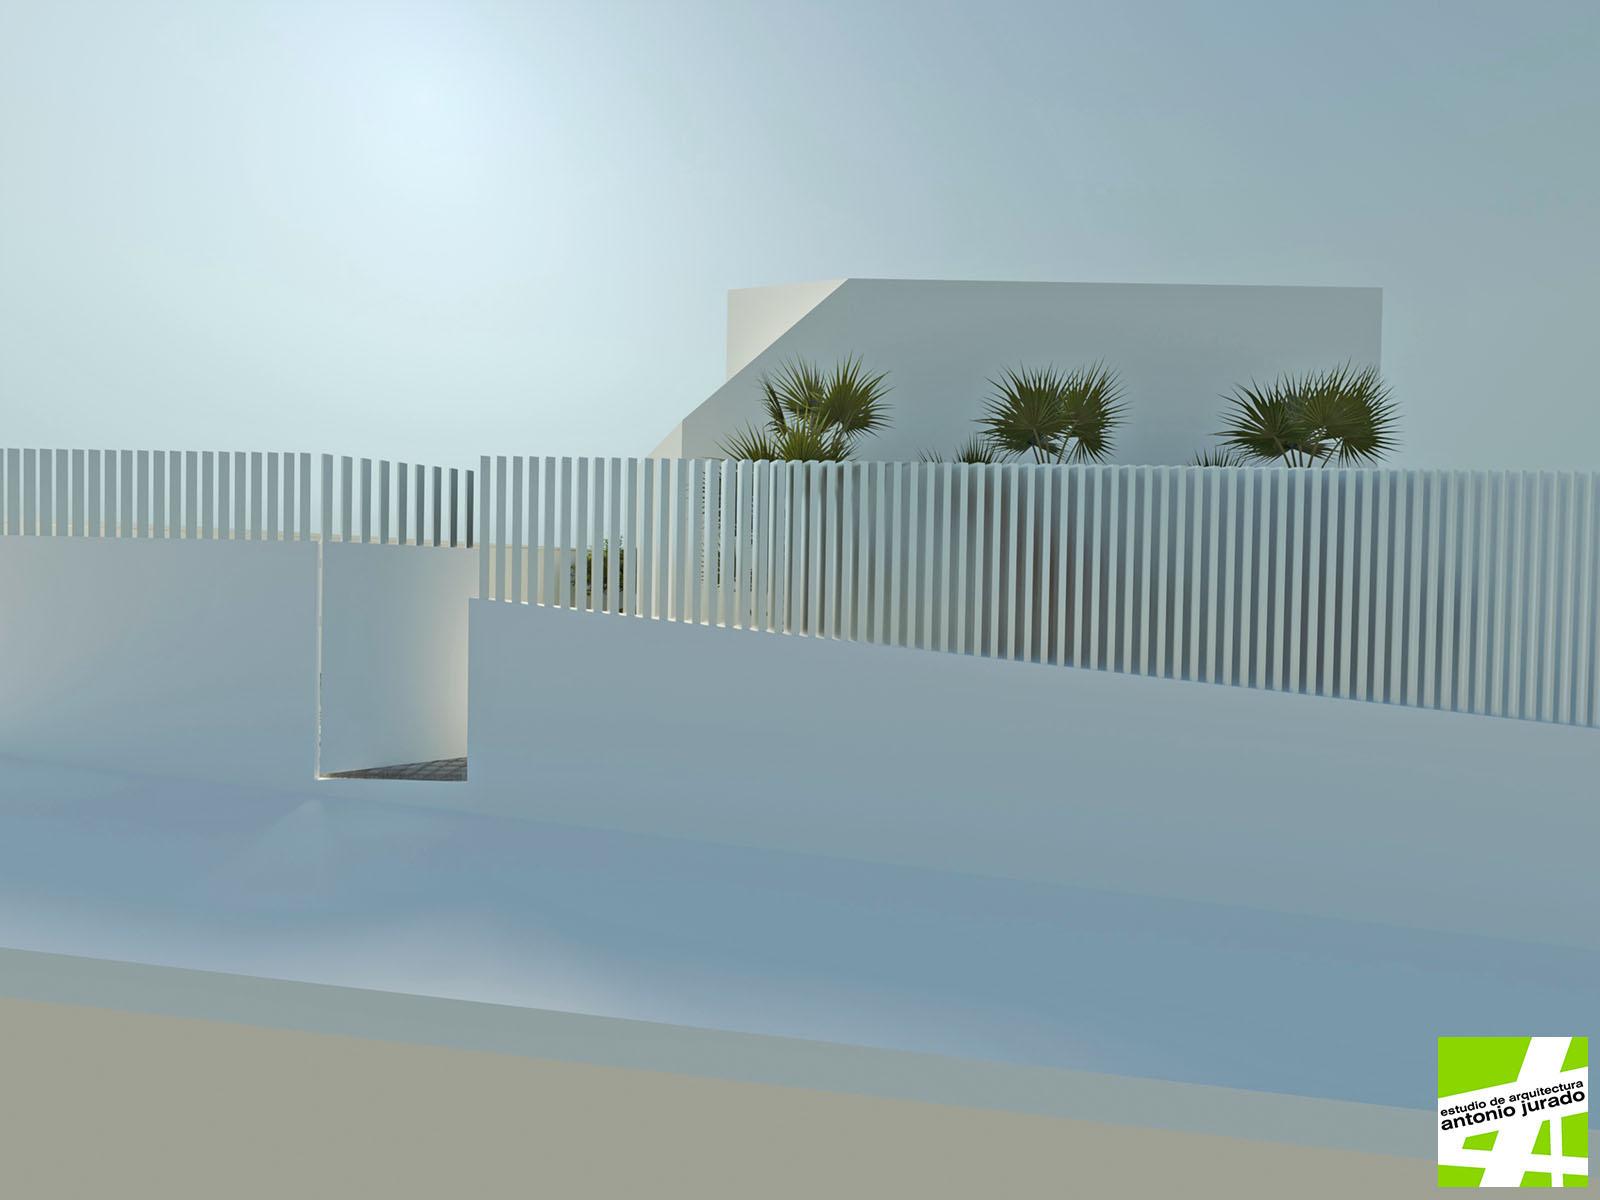 casa-ob-house-alhaurin-malaga-arquitecto-antonio-jurado-00